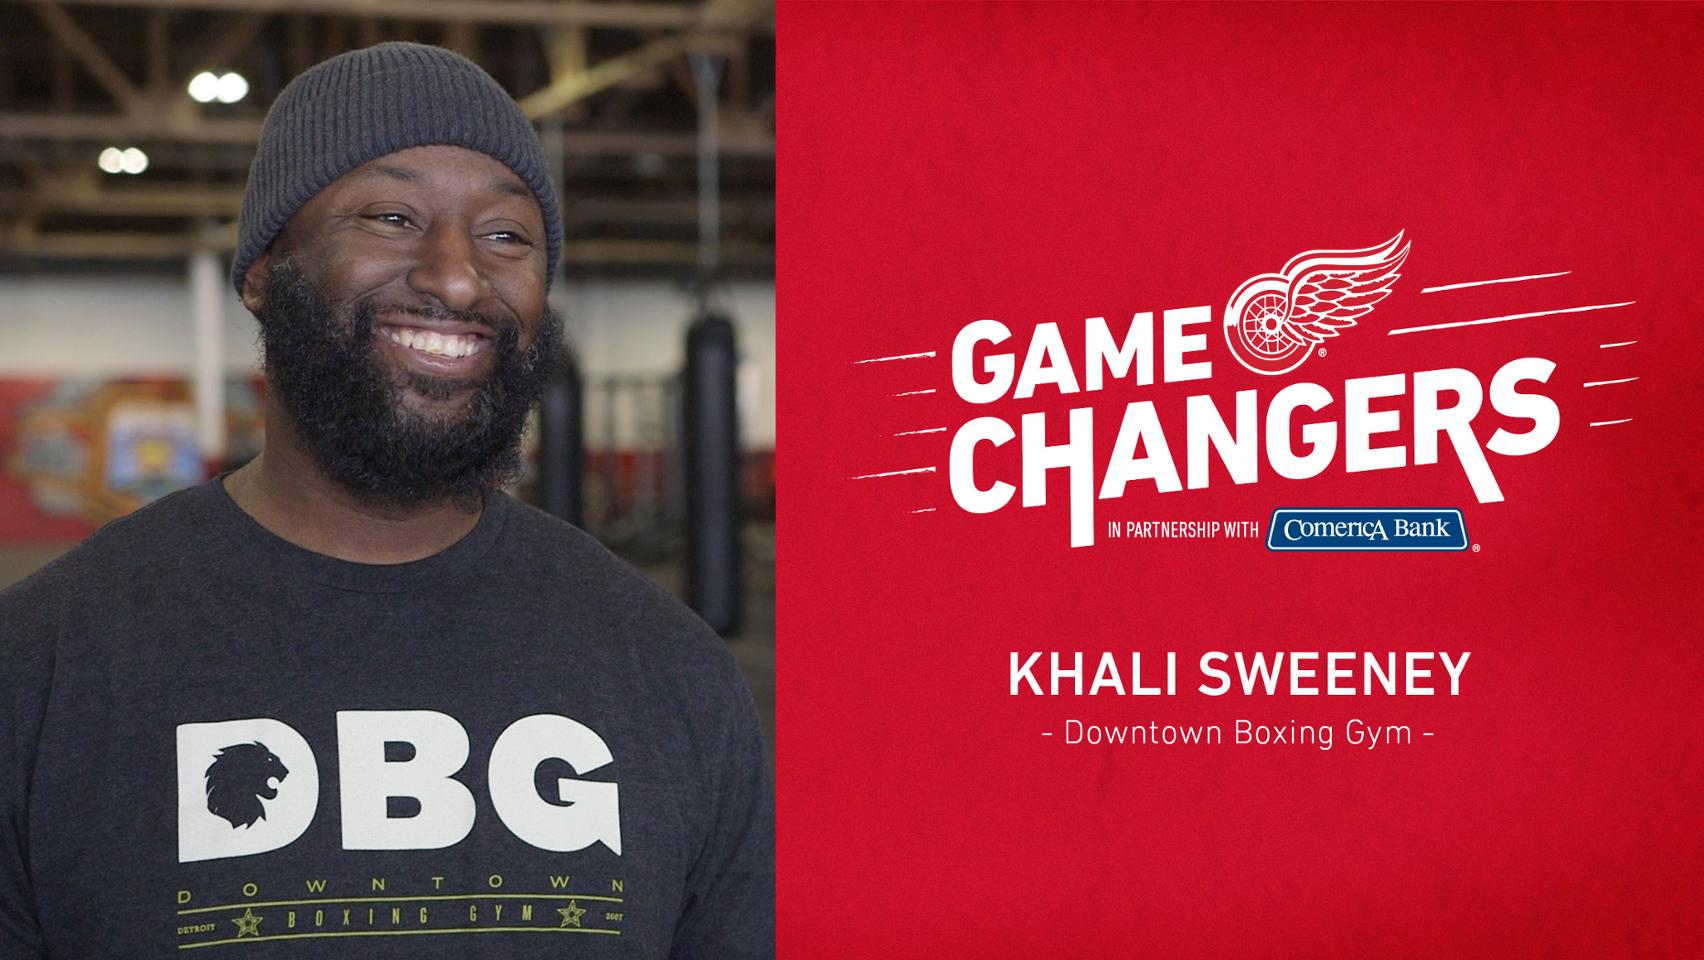 Khali Sweeney